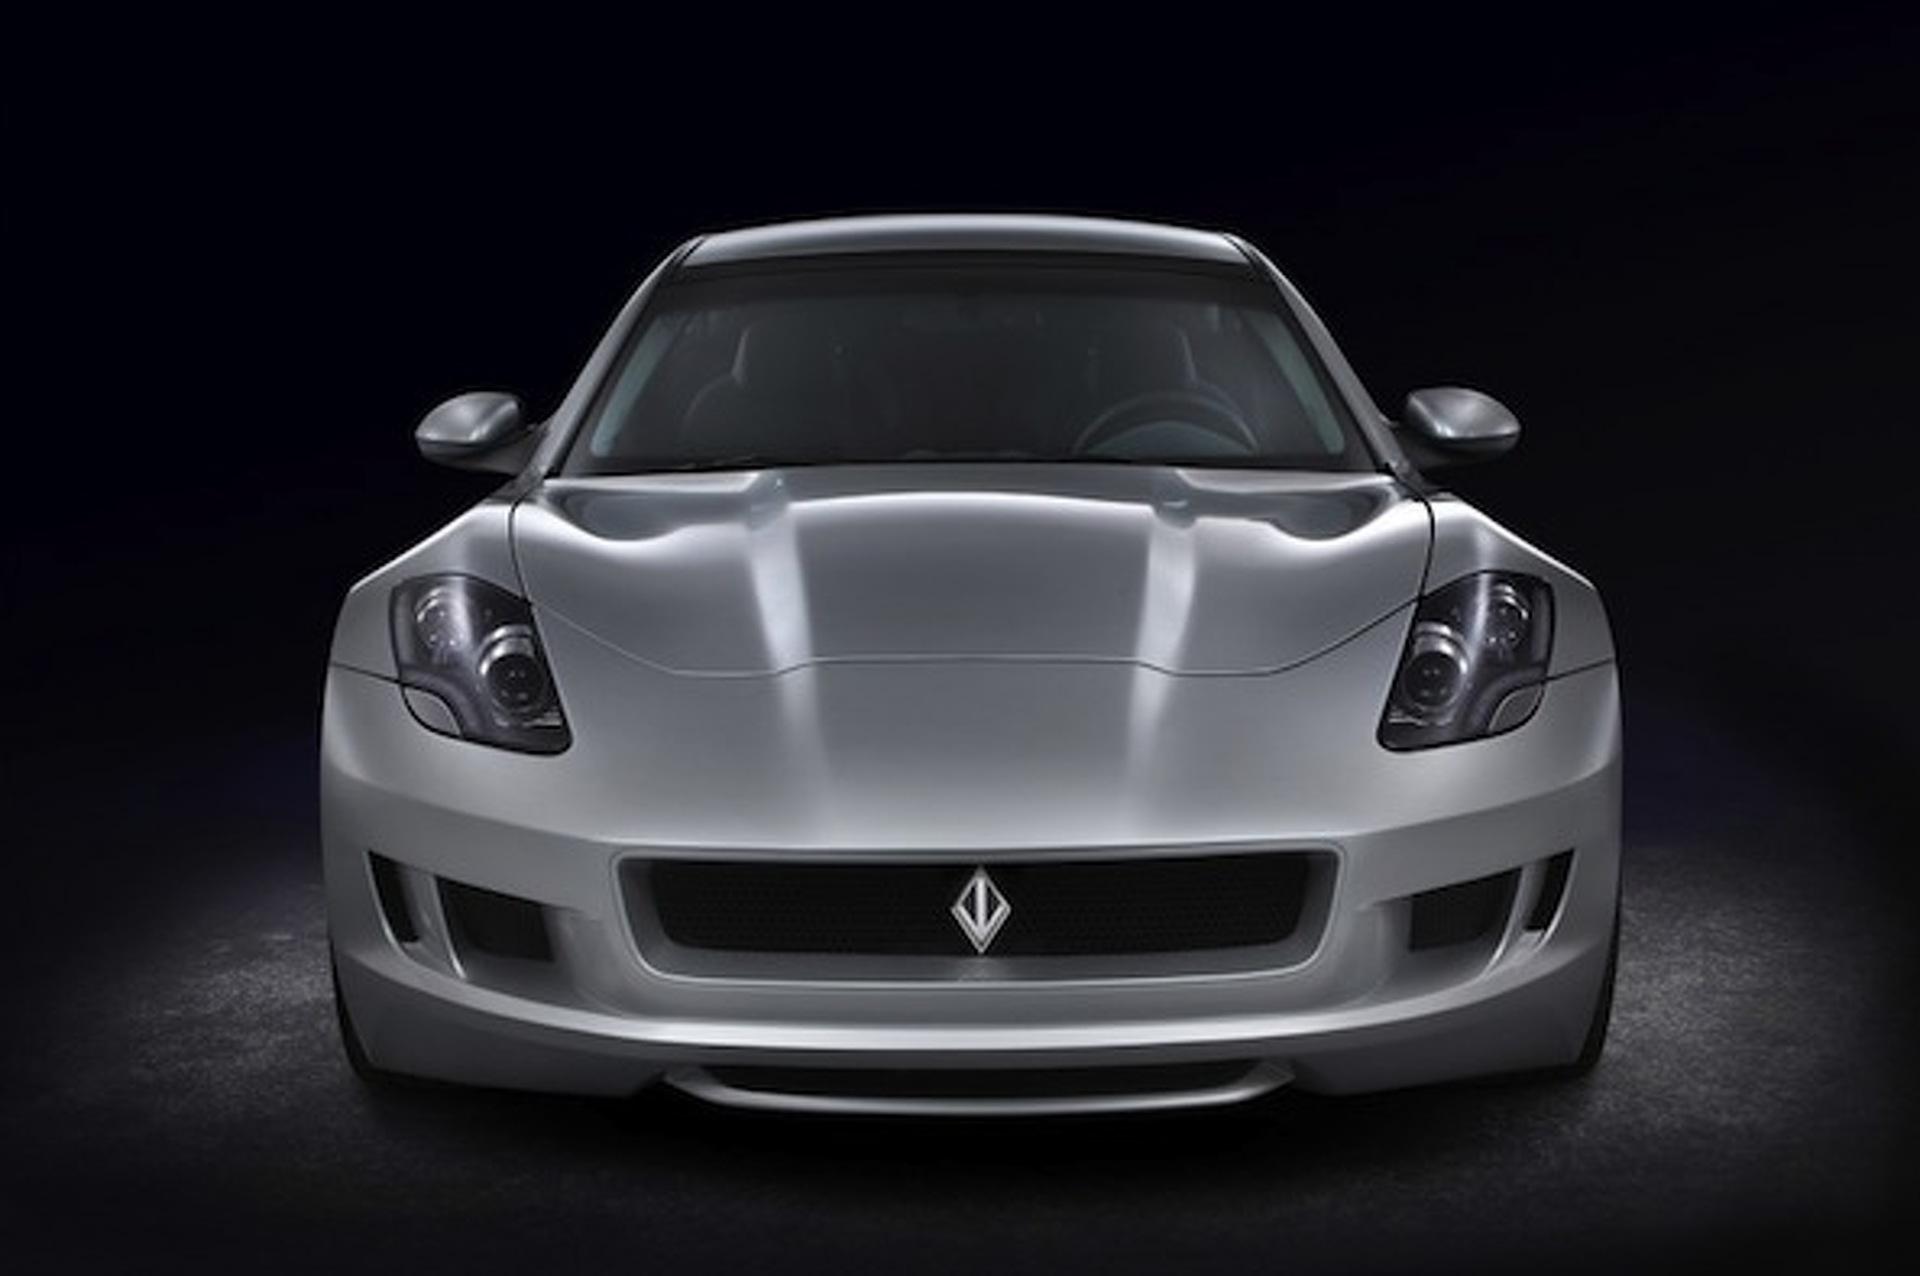 VL Automotive V8-Powered Fisker Karma as Amazing as it Sounds